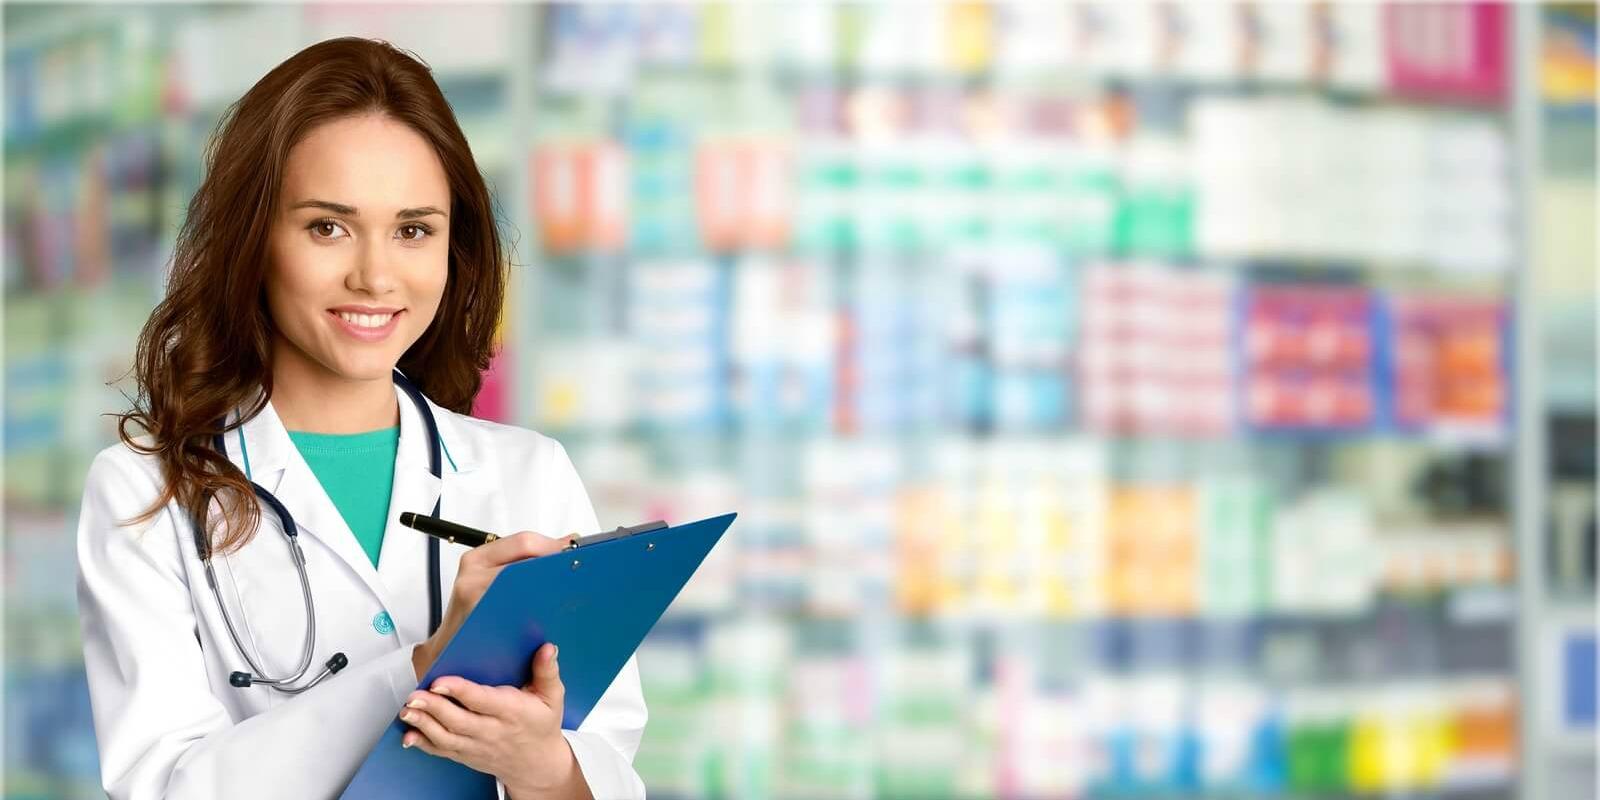 Job seeker looking at a list of flexible jobs.